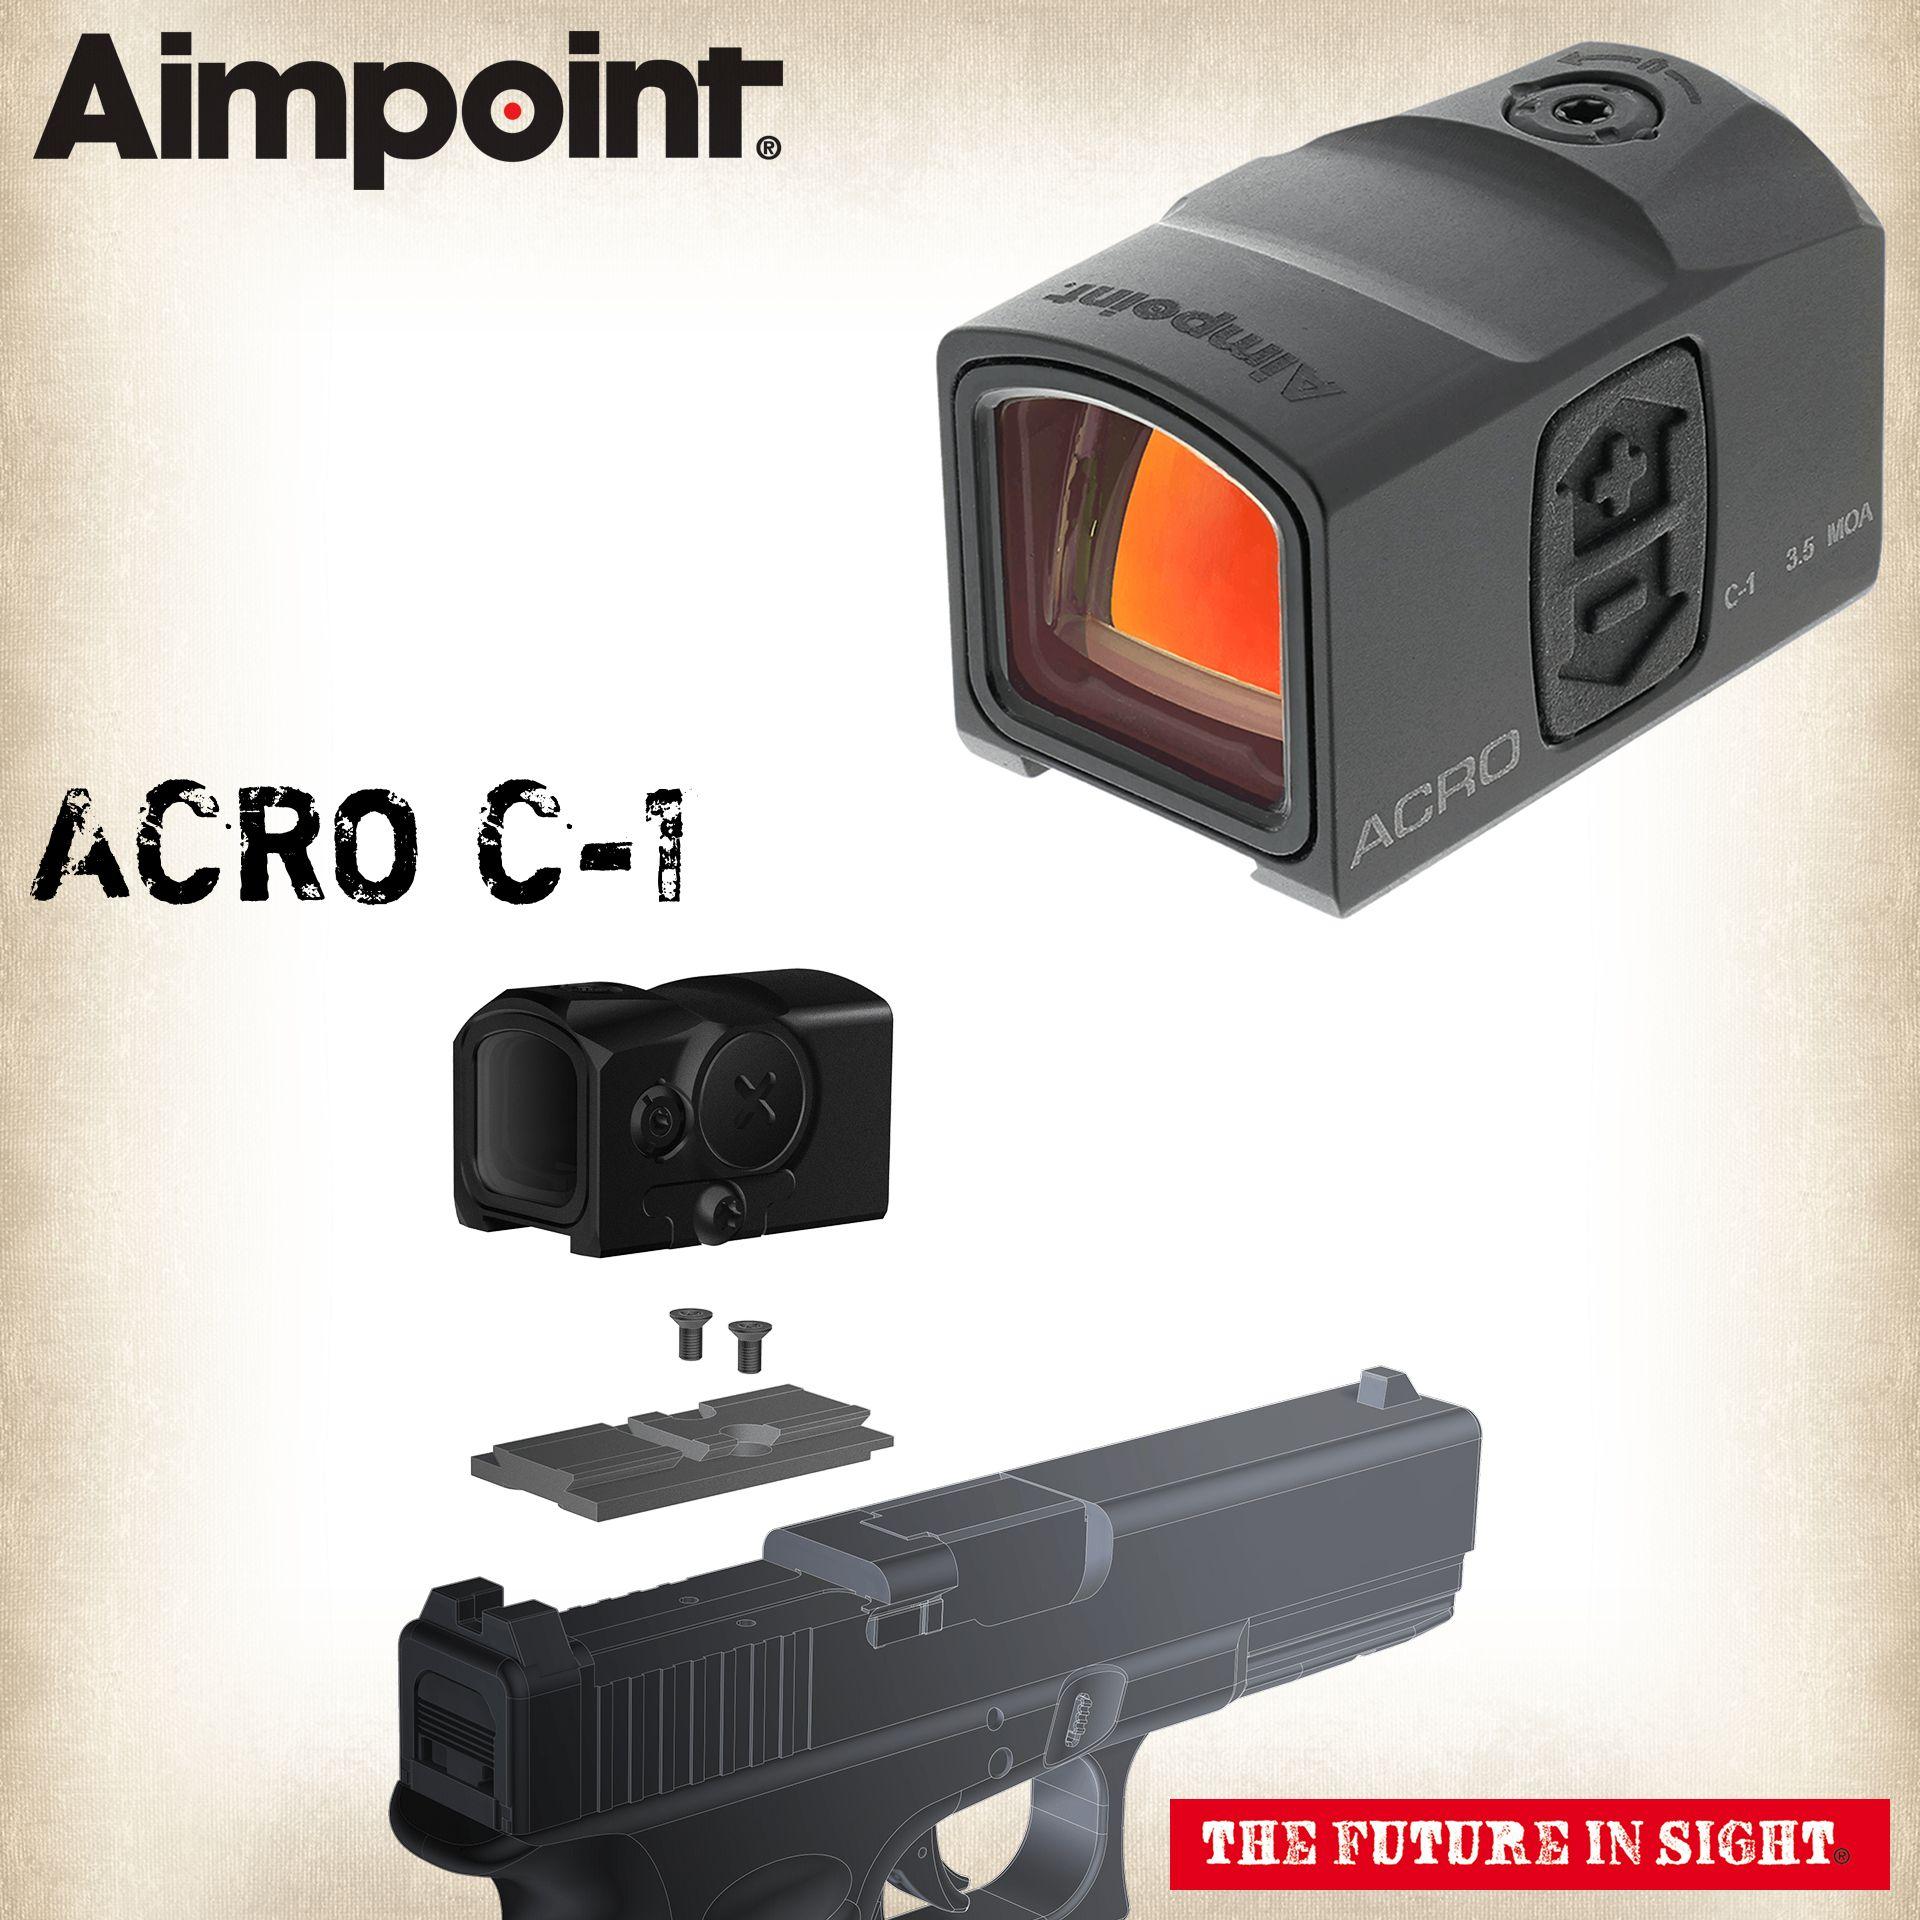 De Aimpoint Acro C-1